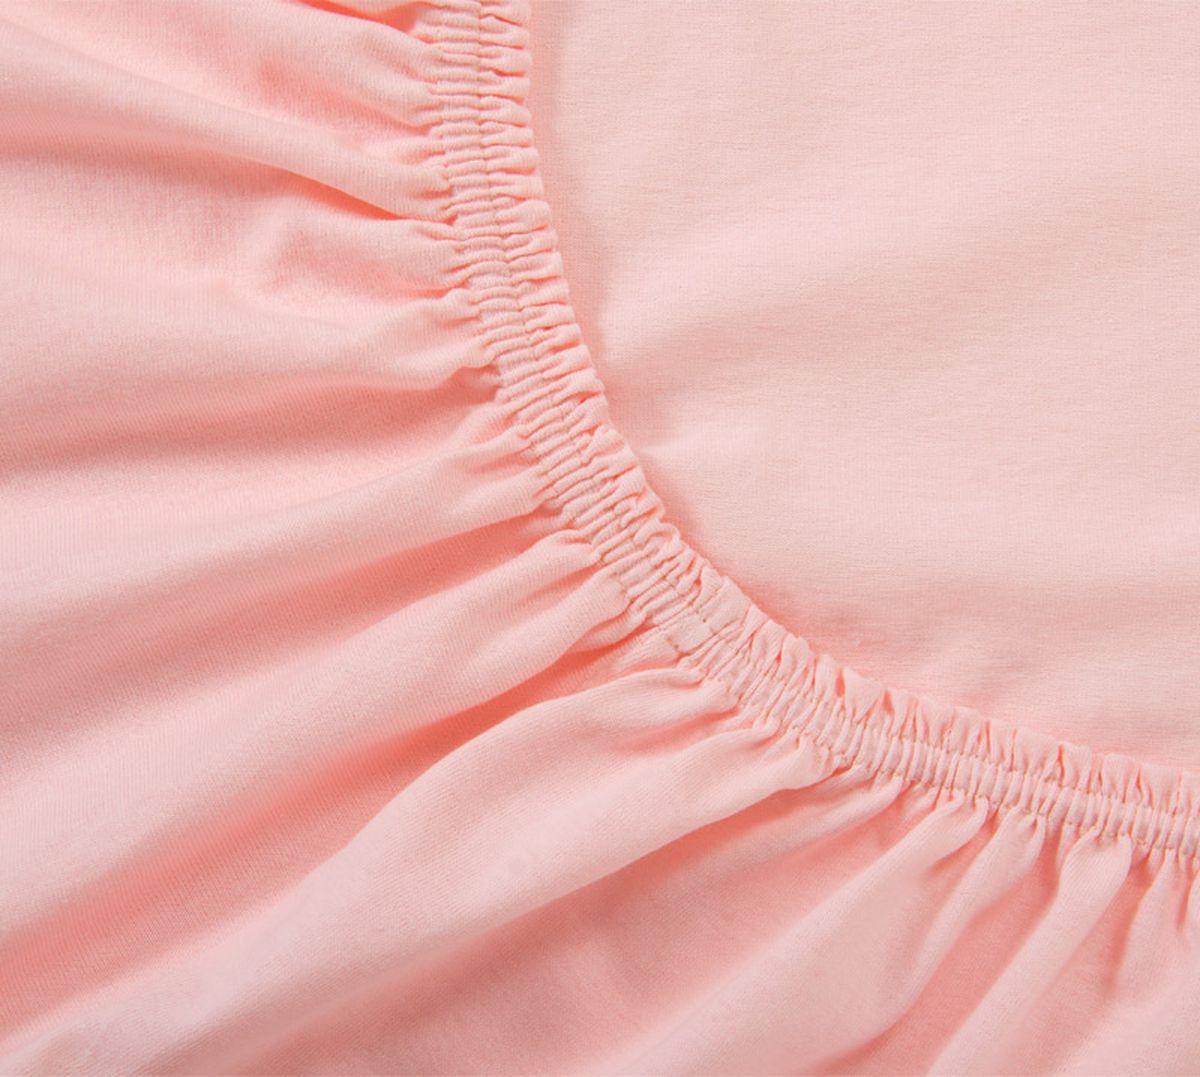 "Простыня ""Текс-Дизайн"", трикотаж, на резинке, цвет: розовый, 160 х 200 х 20 см. Р013Т"